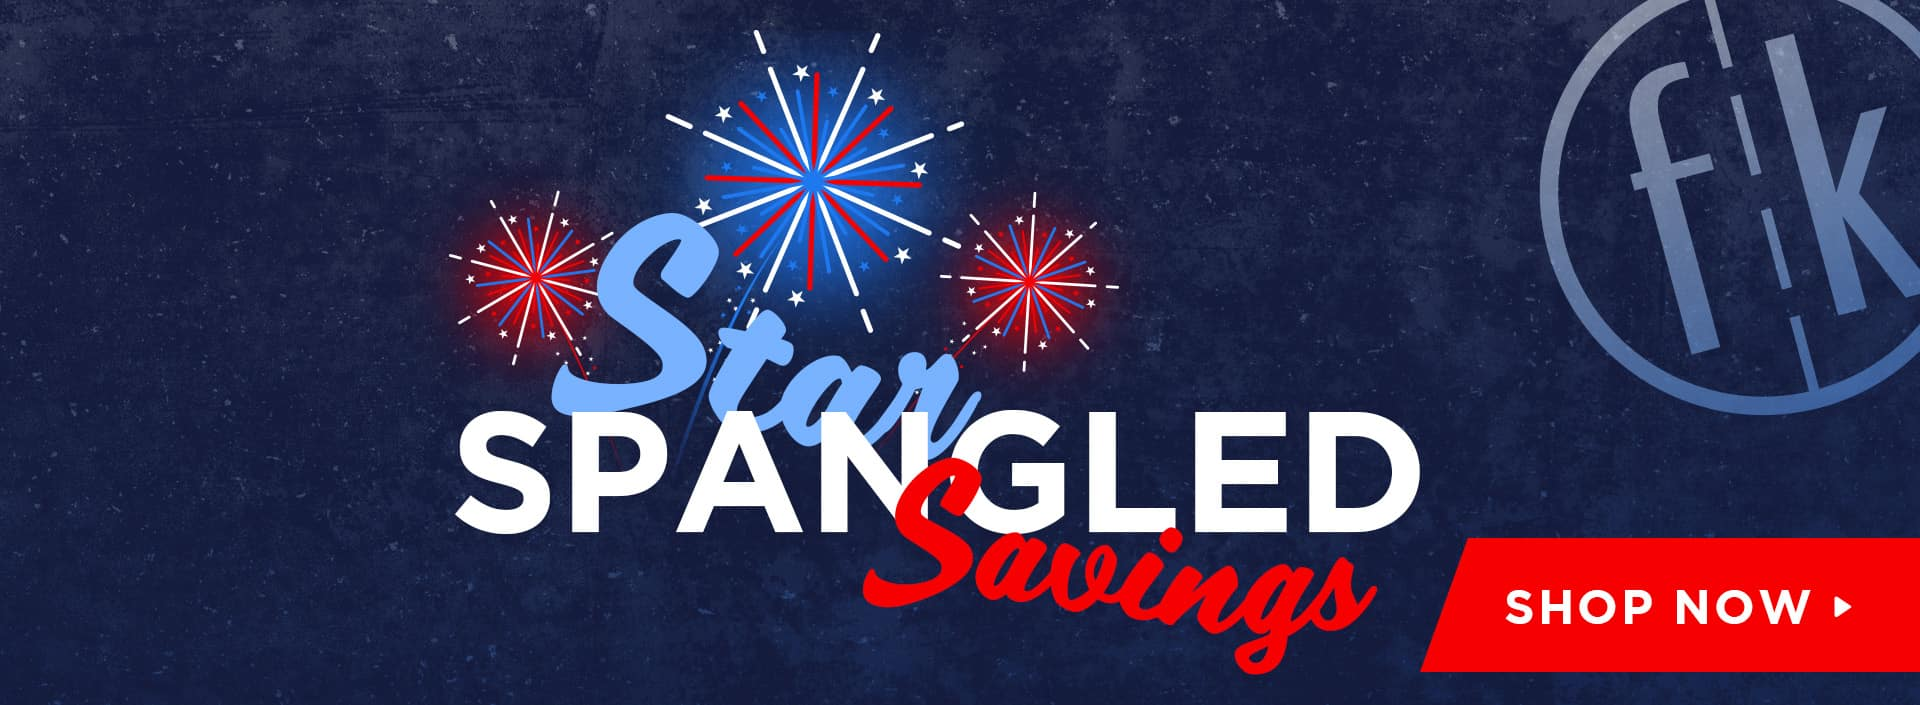 Star Spangled Savings